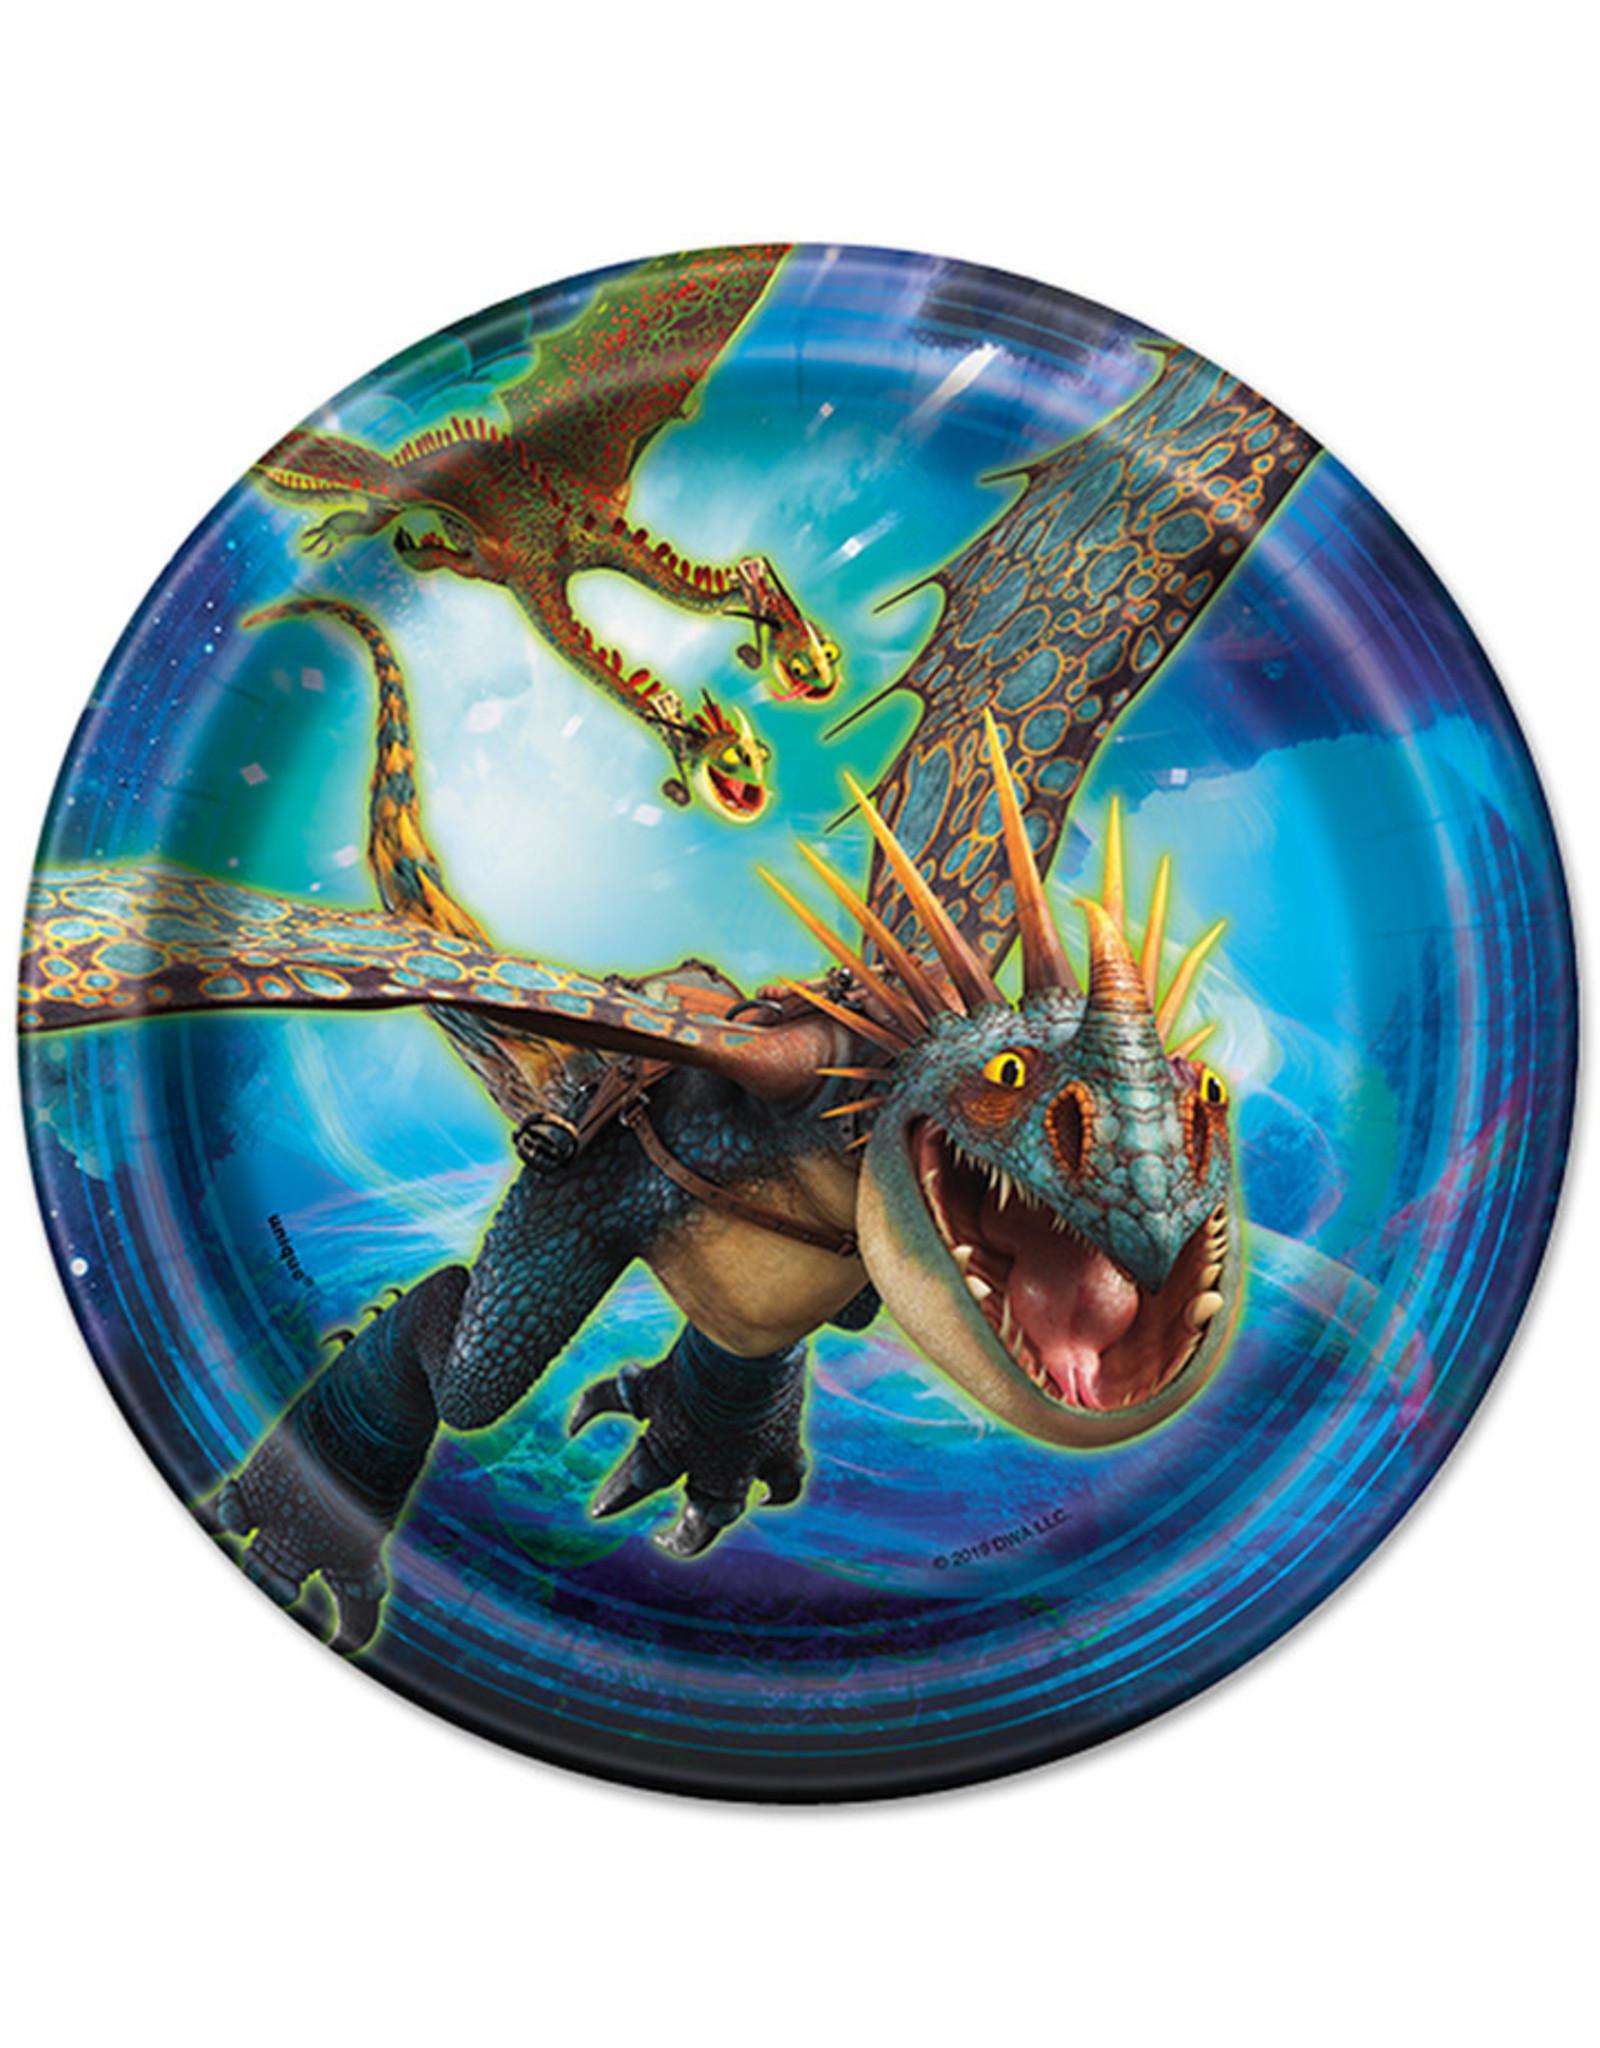 UNIQUE INDUSTRIES INC How to Train Your Dragon Dessert Plates - 8ct